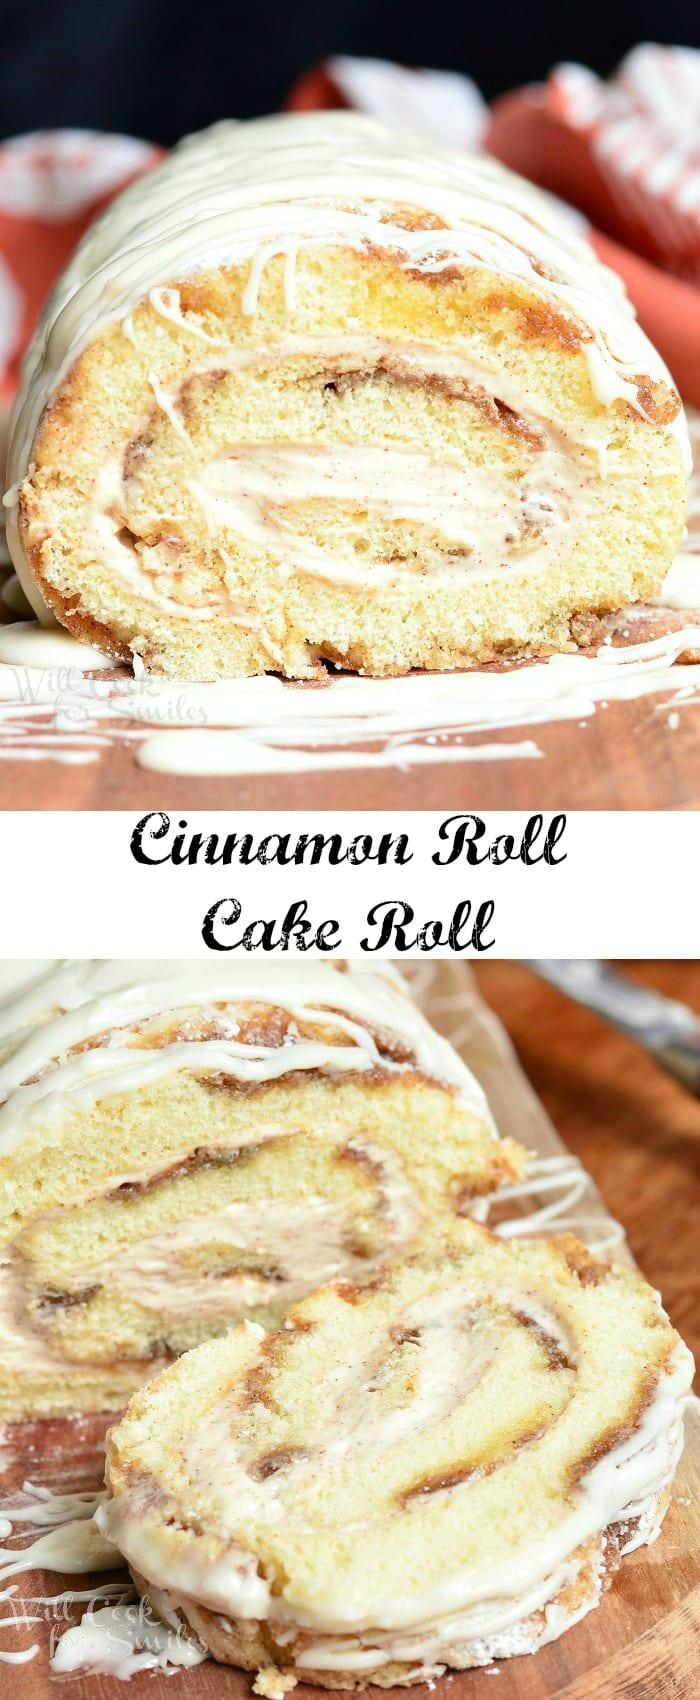 Cinnamon Roll Cake Roll from willcookforsmiles.com #cinnabon #dessert